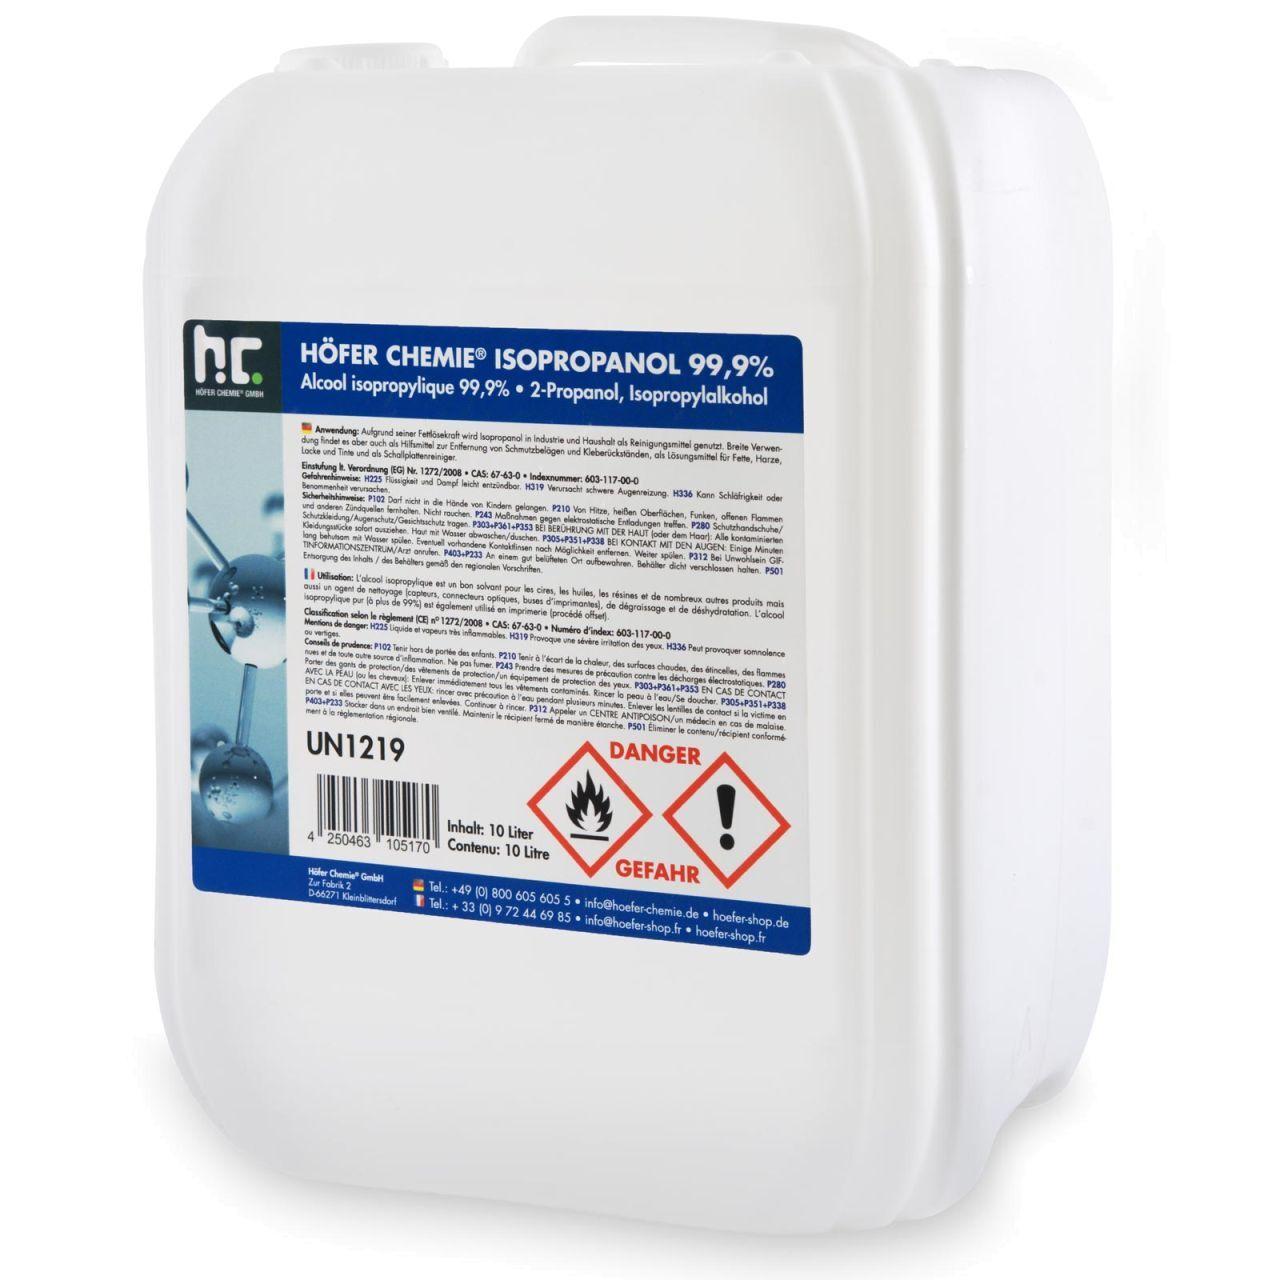 Höfer Chemie 30 l Alcool isopropylique 99,9 % (3 x 10 l)